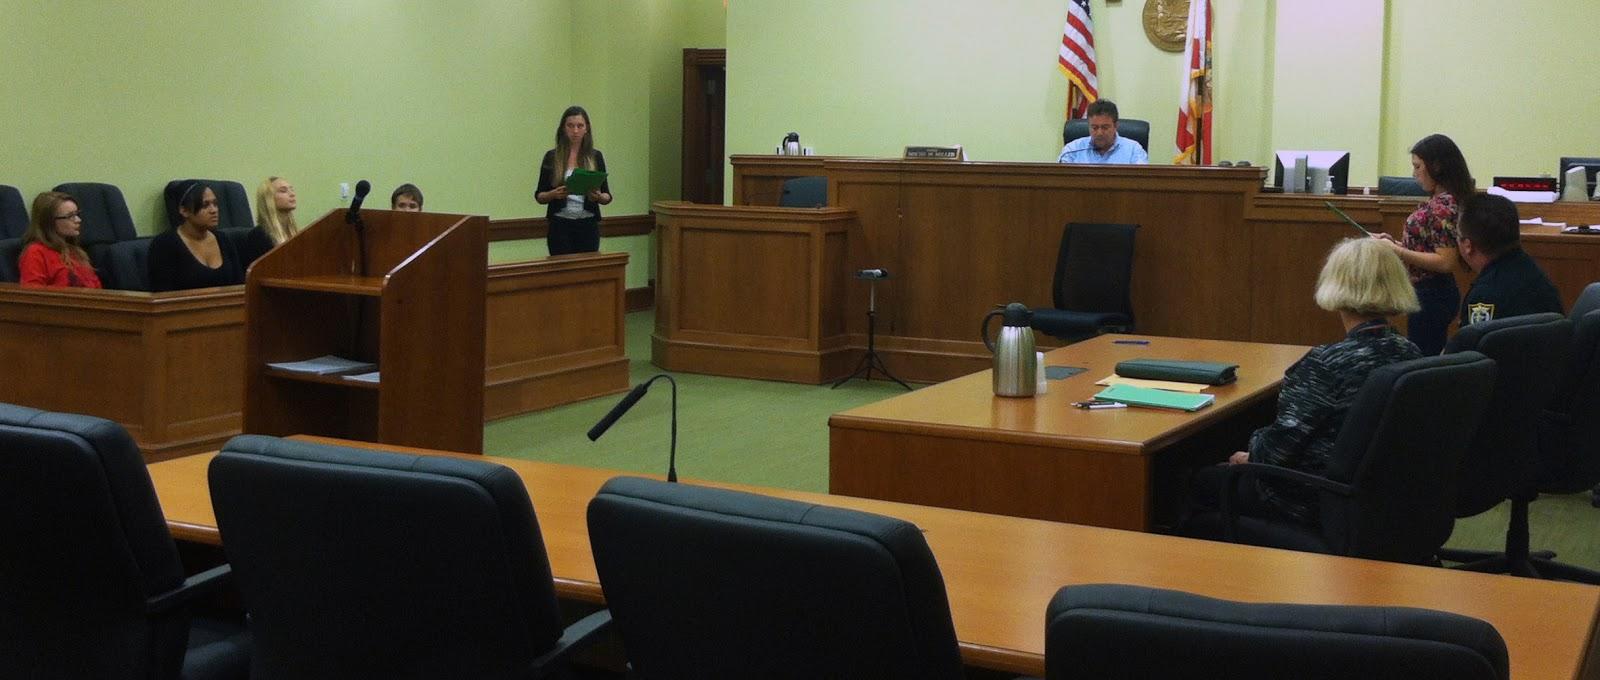 Florida Teen Courts A juvenile justice